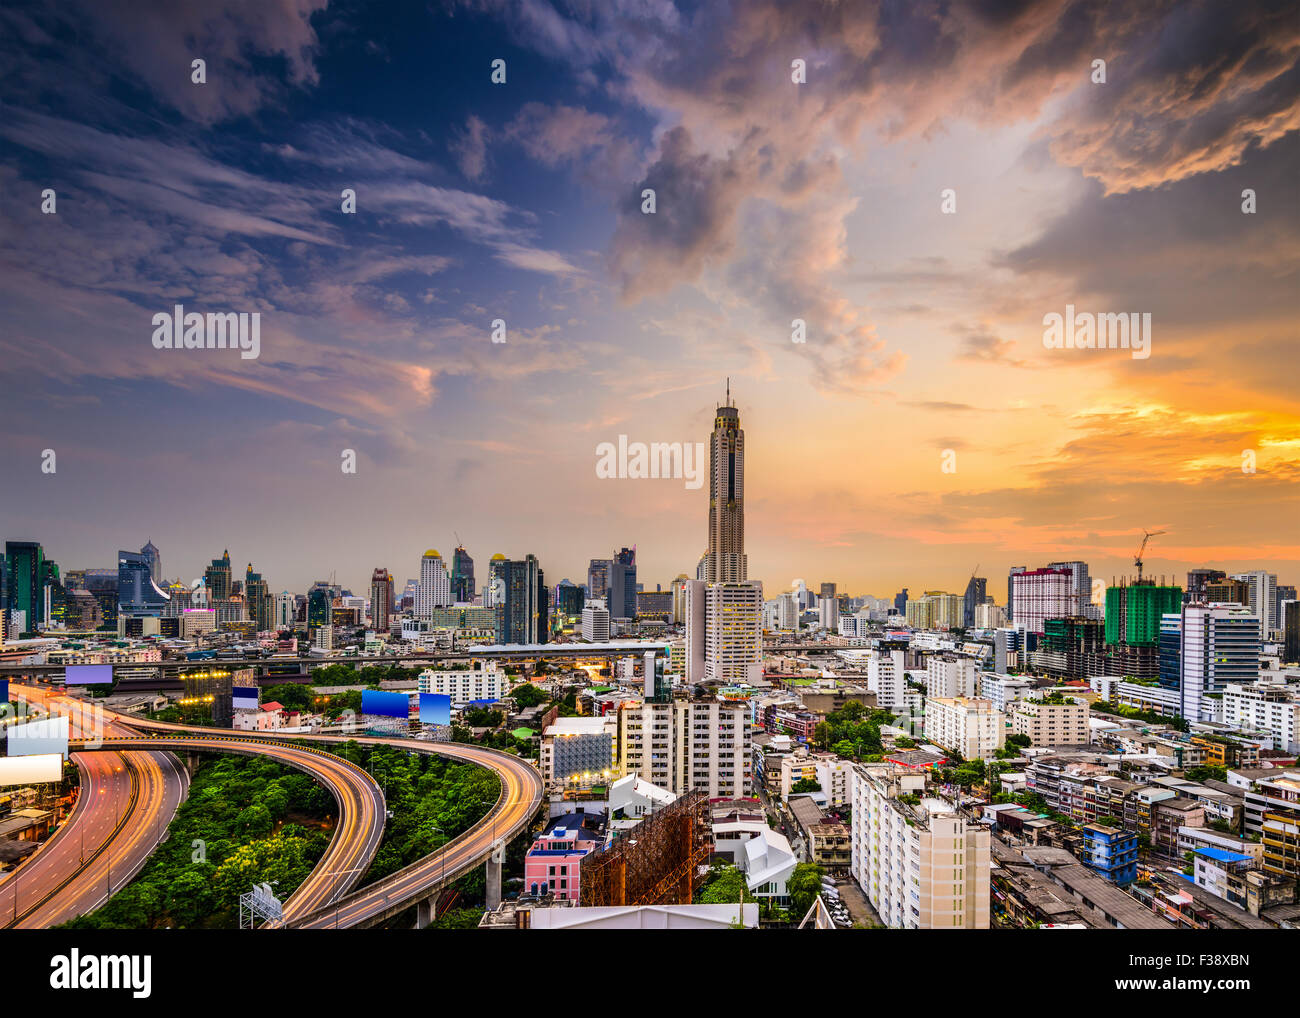 Bangkok, Thailand city skyline of the  Ratchathewi District. - Stock Image